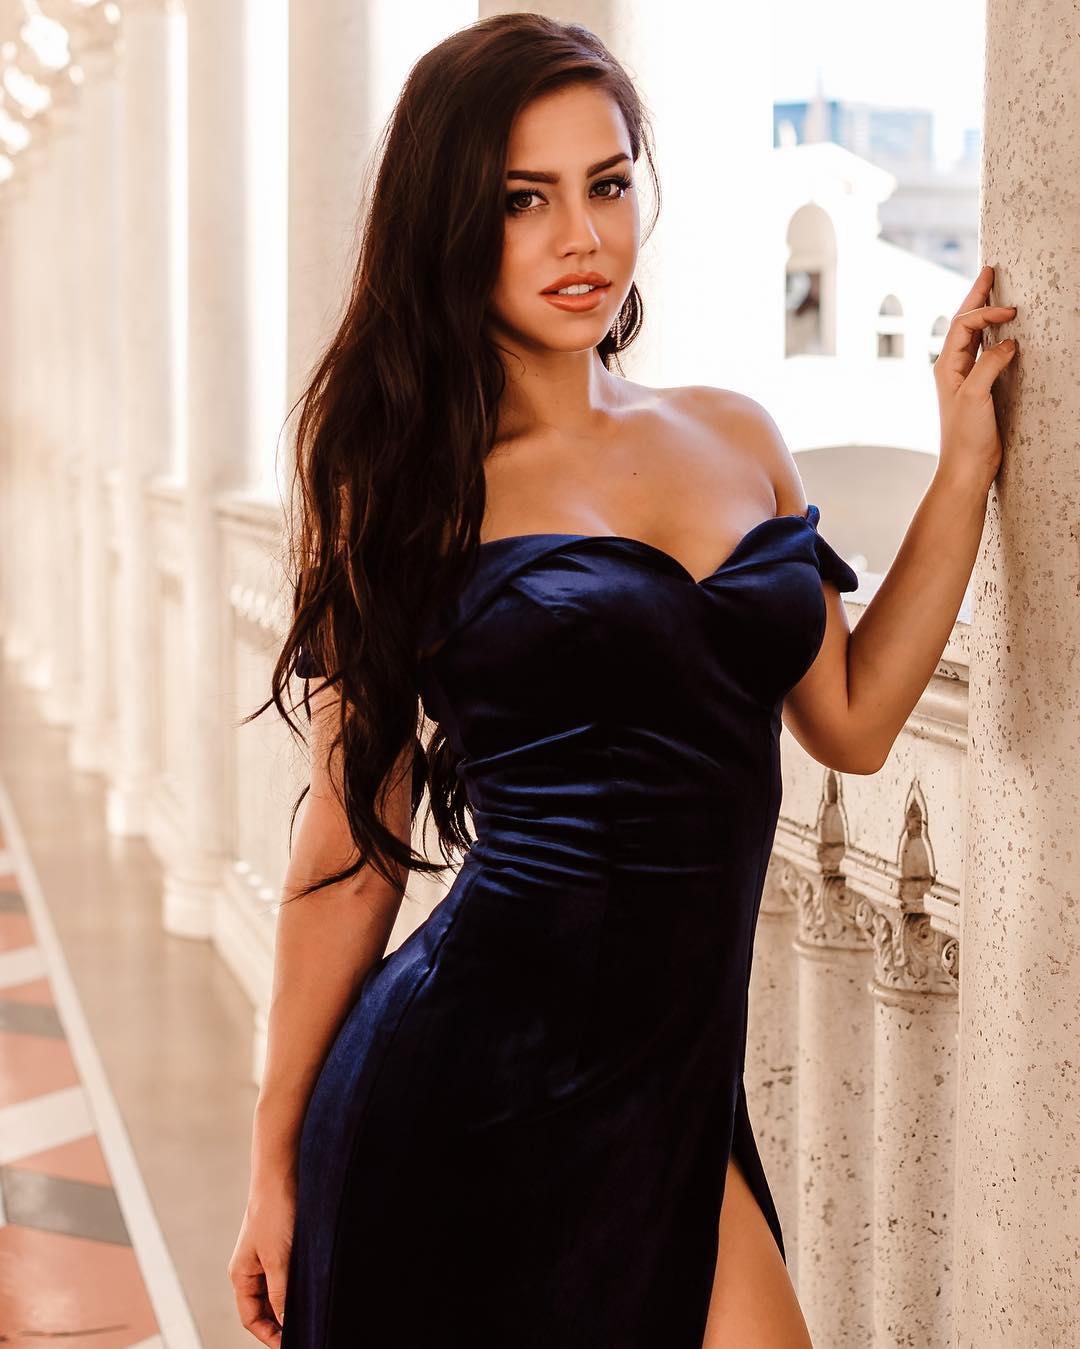 Alina-Lopez-Wallpapers-Insta-Fit-Bio-2